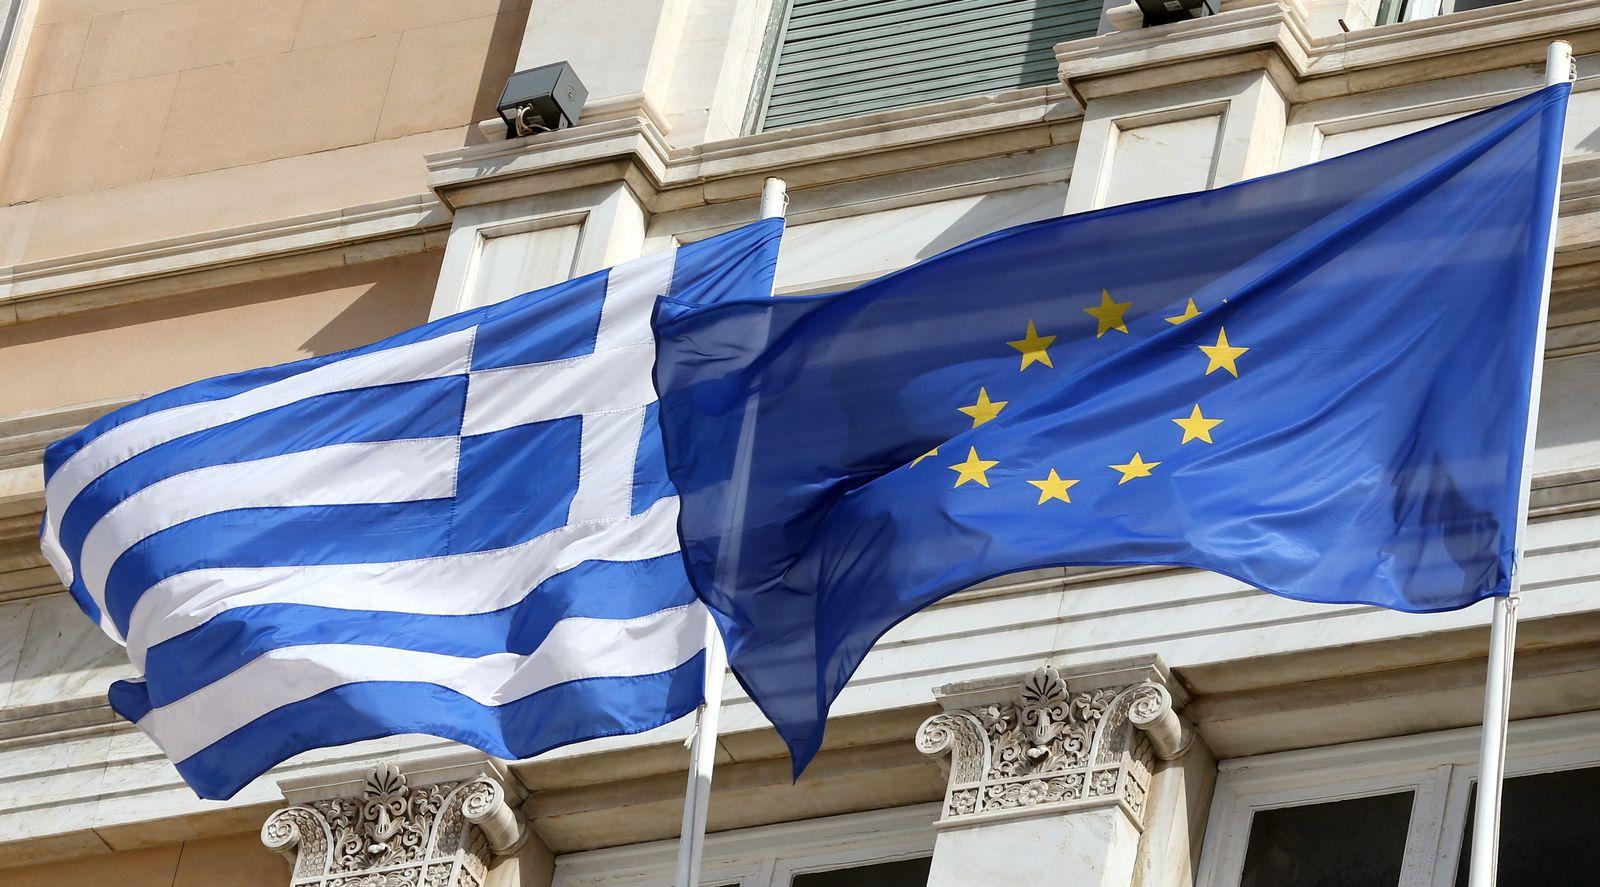 Griechische unn europäische Fahne